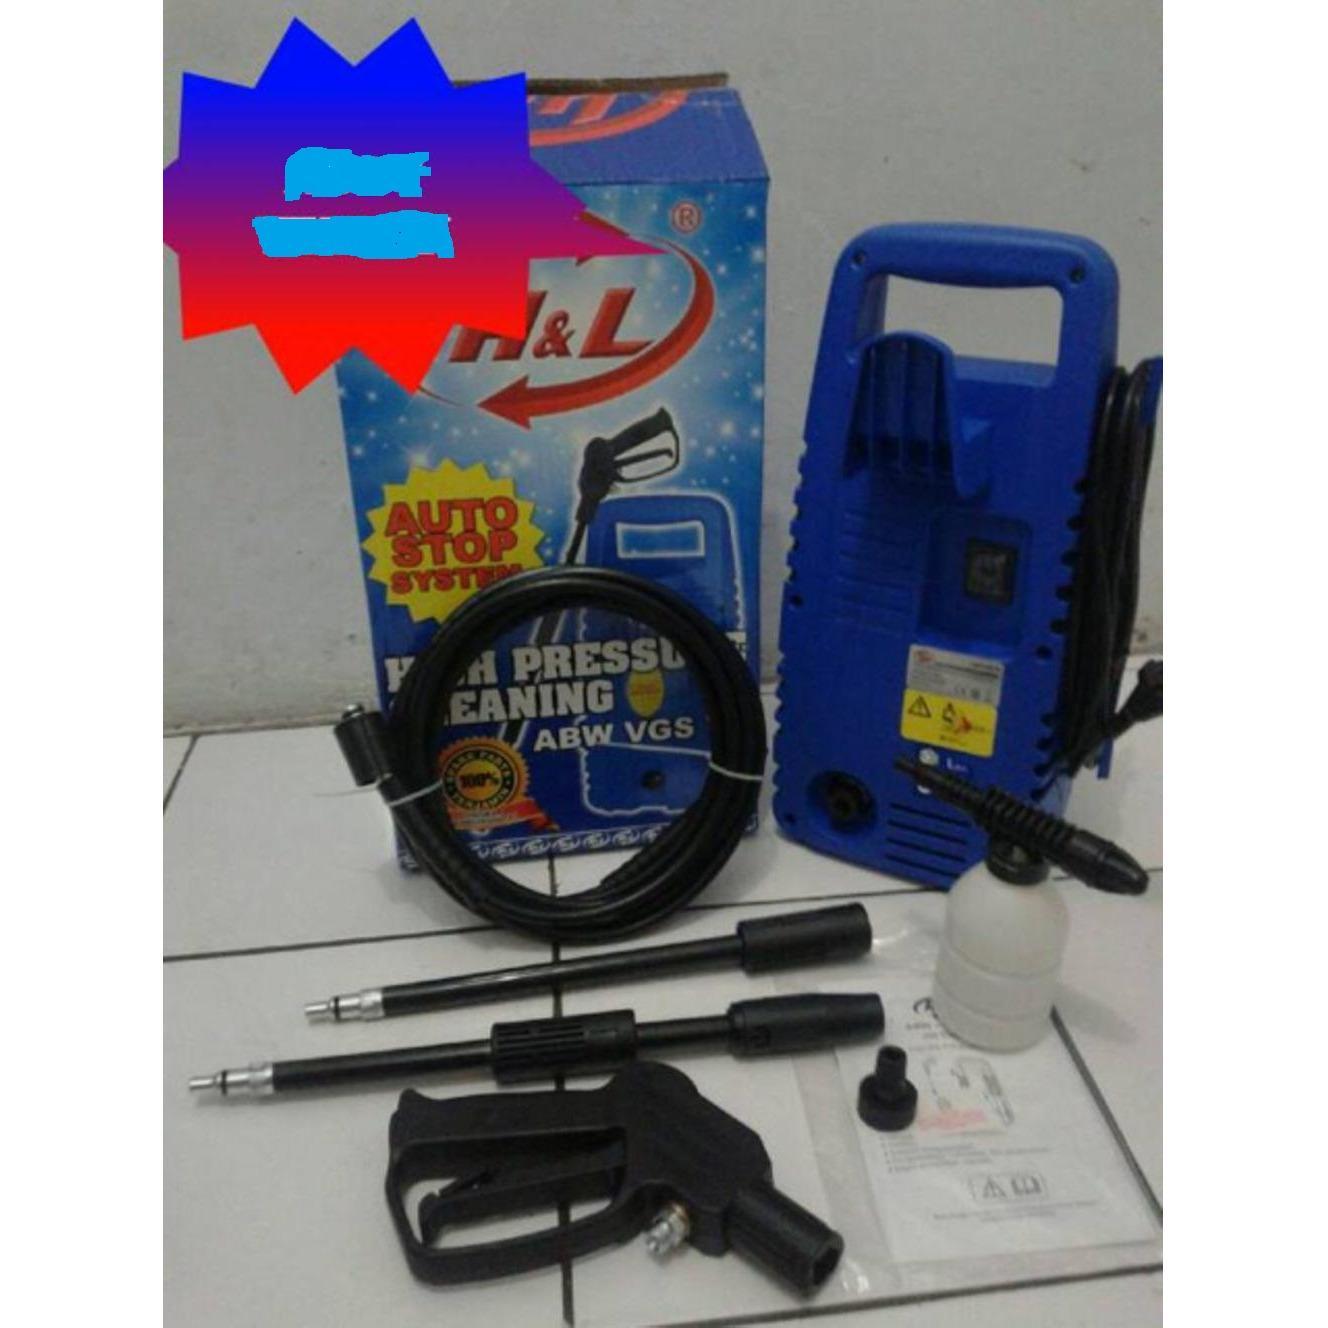 Best Seller ! Alat Mesin Steam Cuci Motor & Mobil Jet Cleaner High Pressure ABW VGS 70